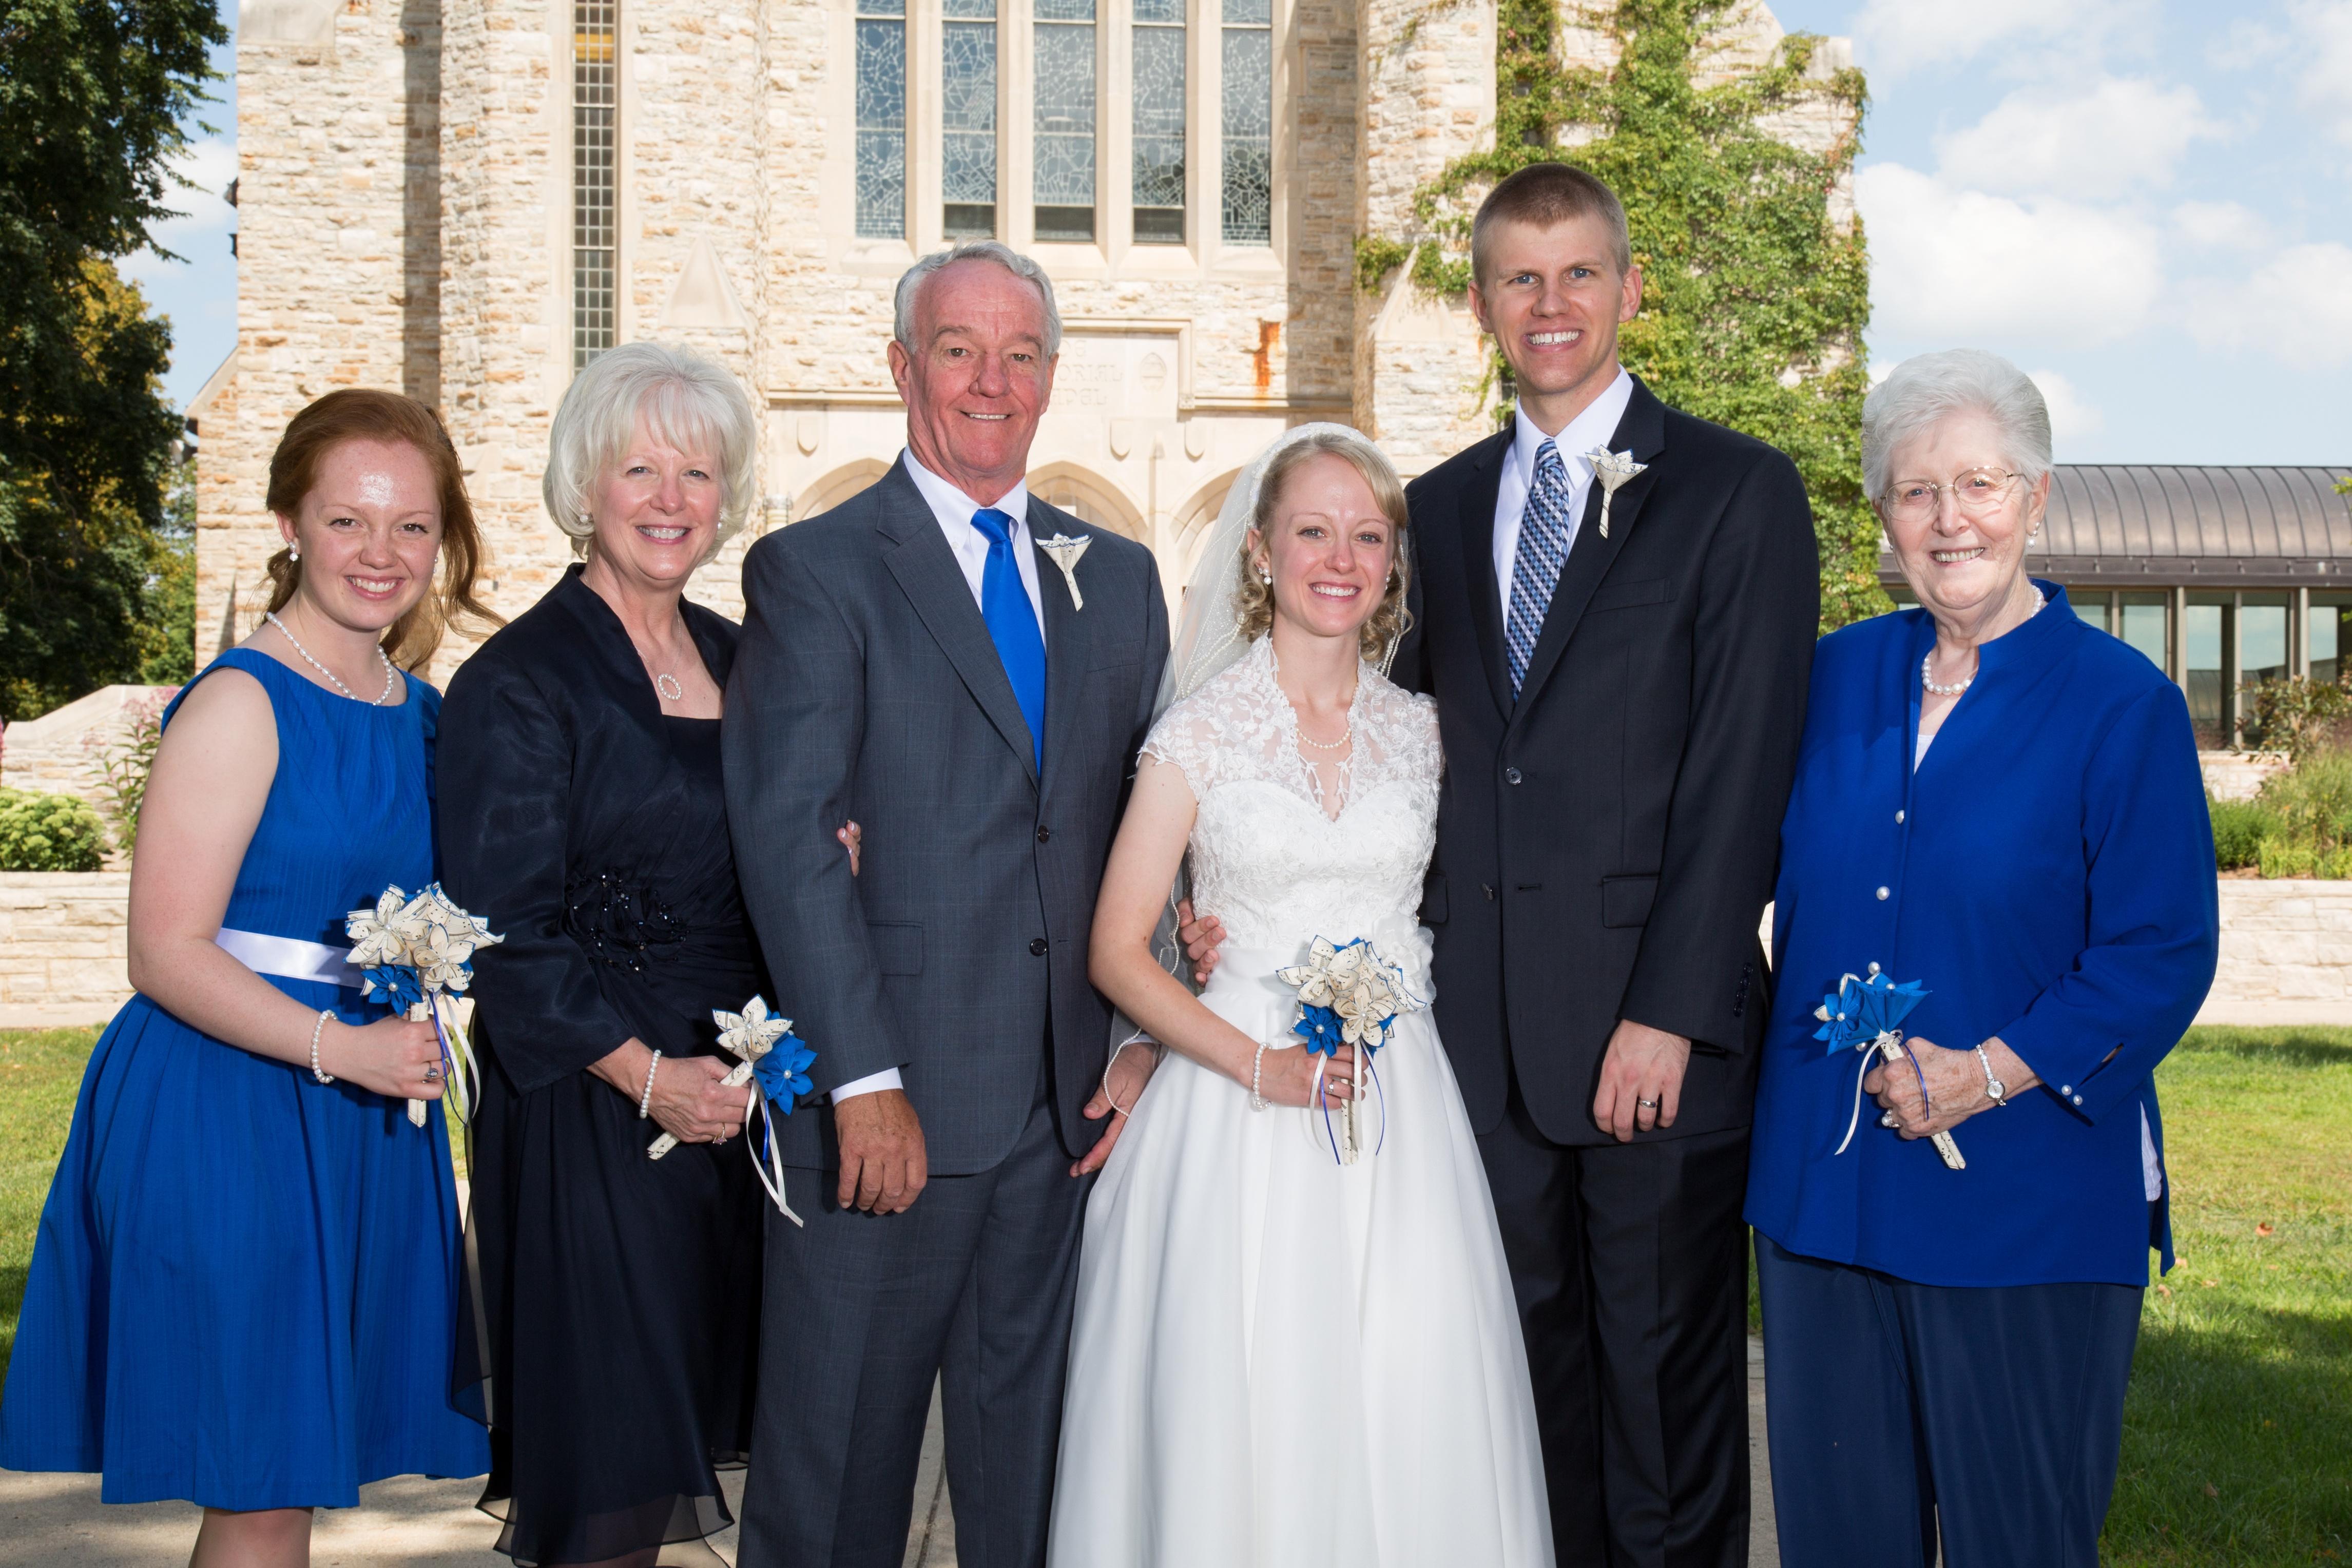 19q - 2013 Wedding - Emily, Kim, Tom, Abbe, Aaron and Nana